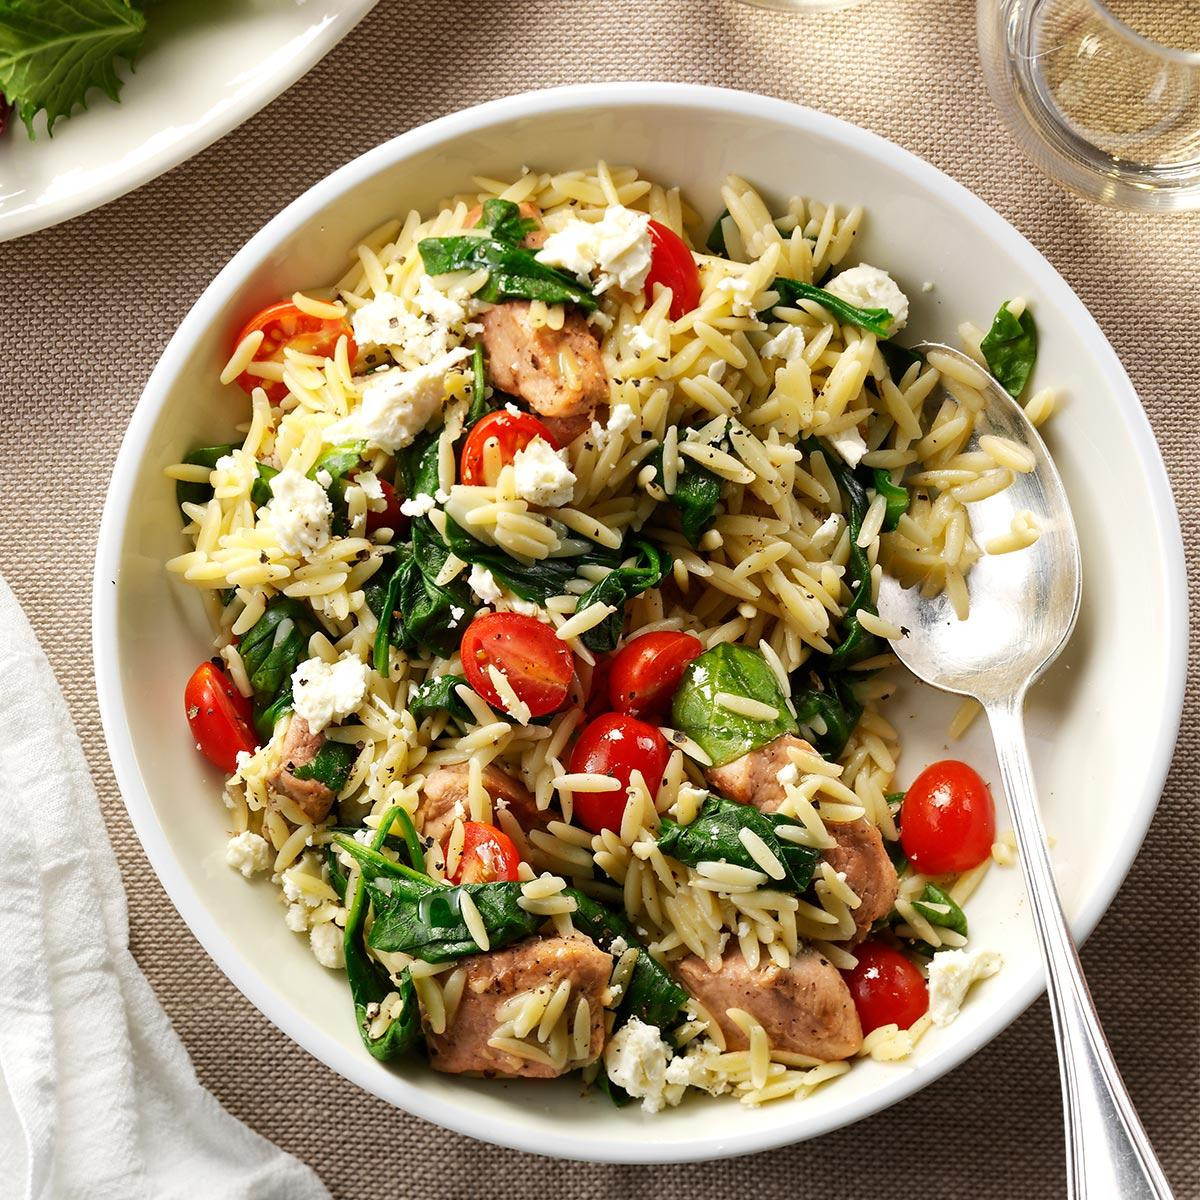 Healthy Dinner Choices  Mediterranean Pork and Orzo Recipe